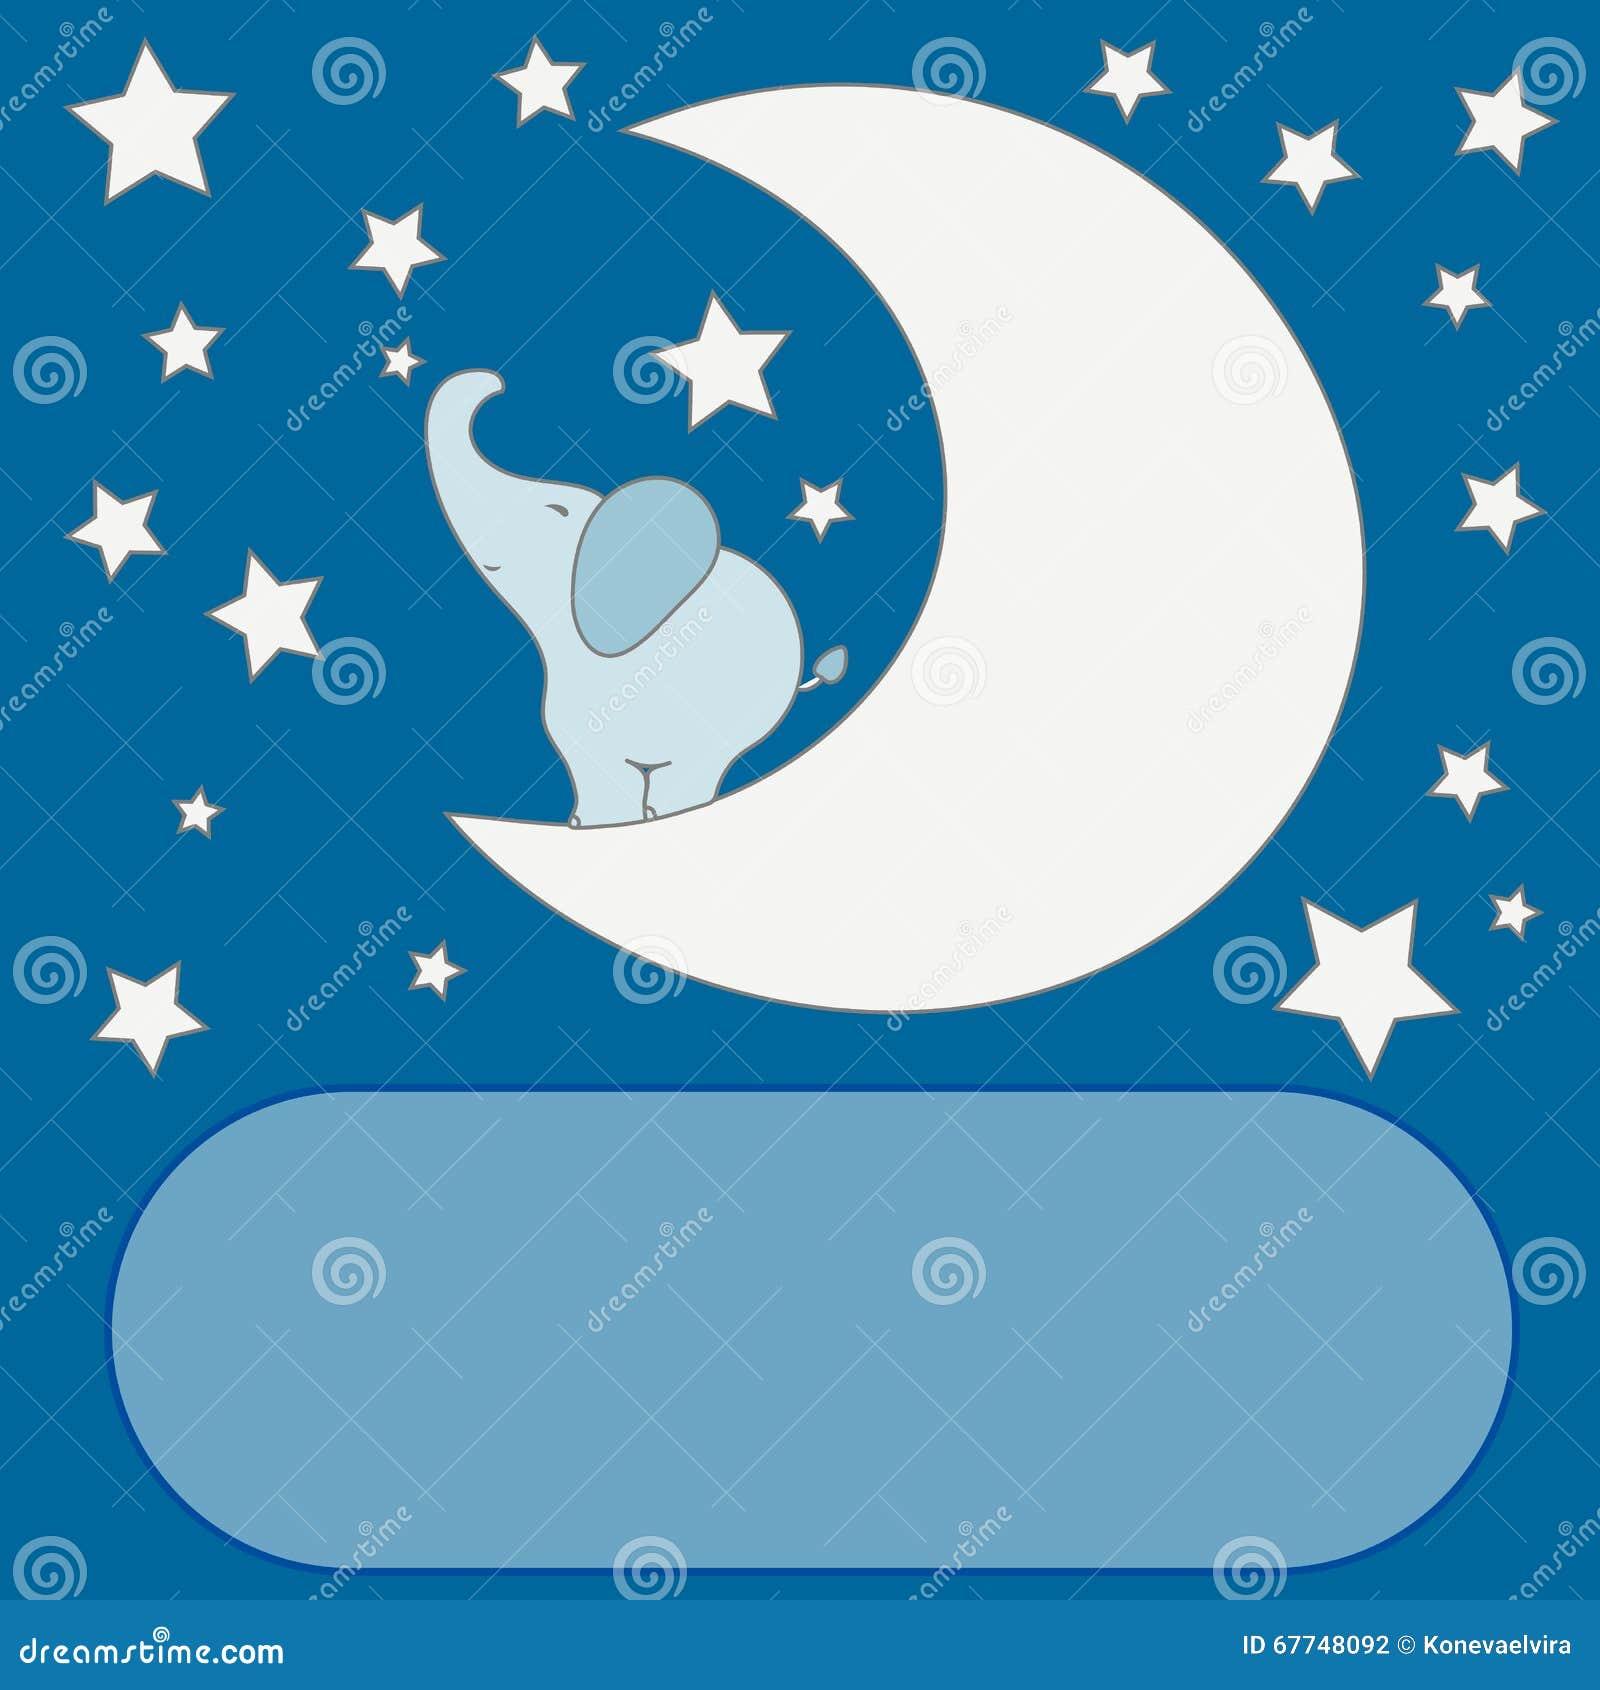 Cute Cartoon Elephant On The Moon In The Night Sky, Stars ...